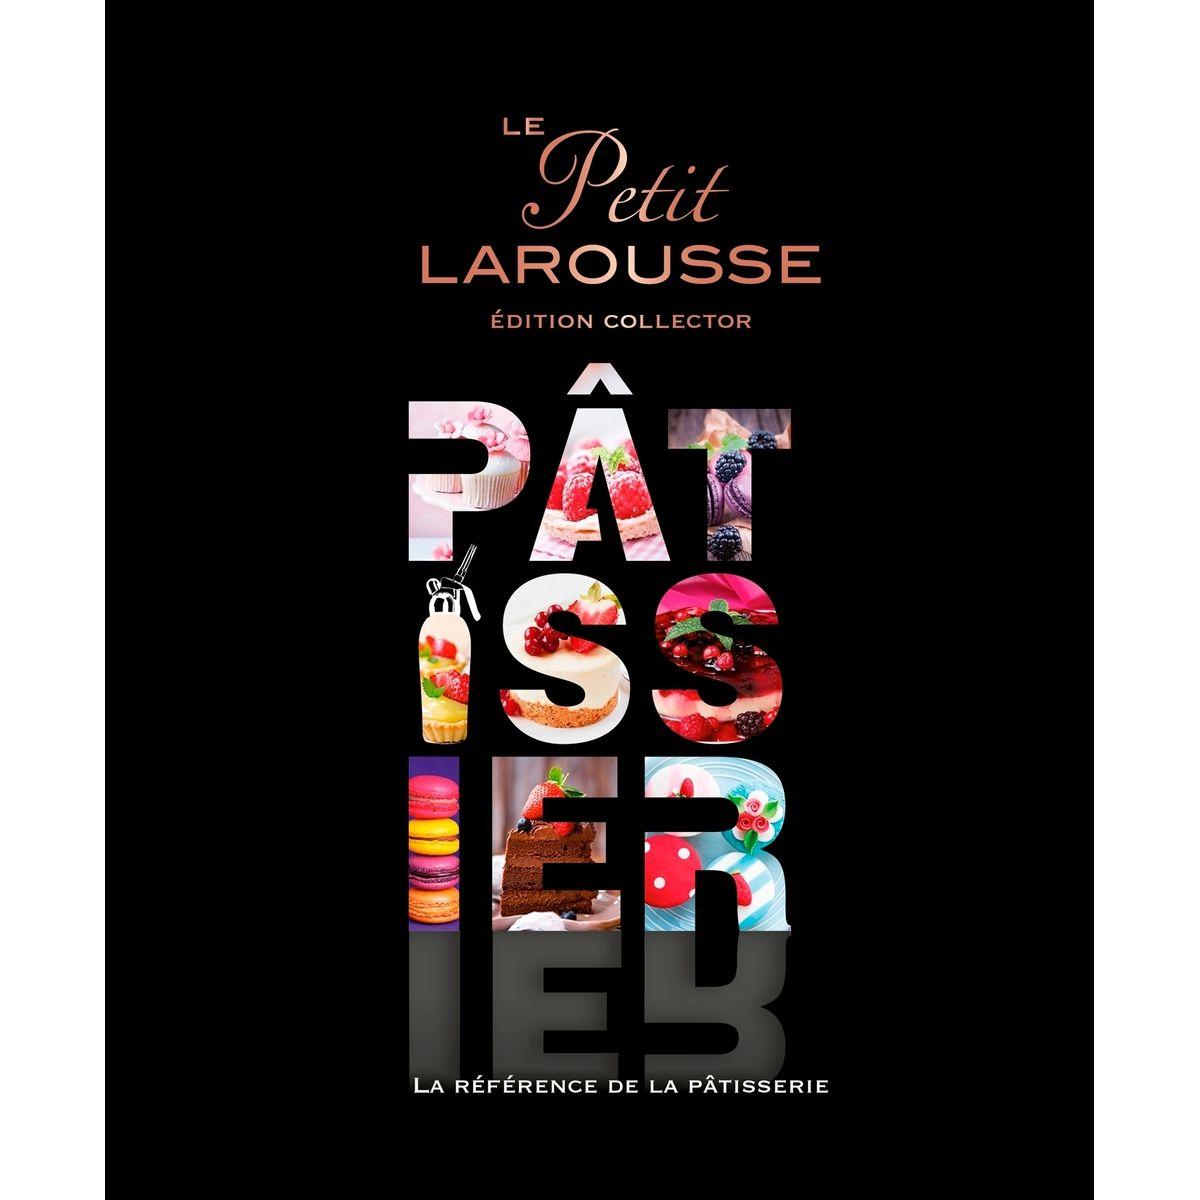 Le Petit Larousse Pâtissier - Larousse